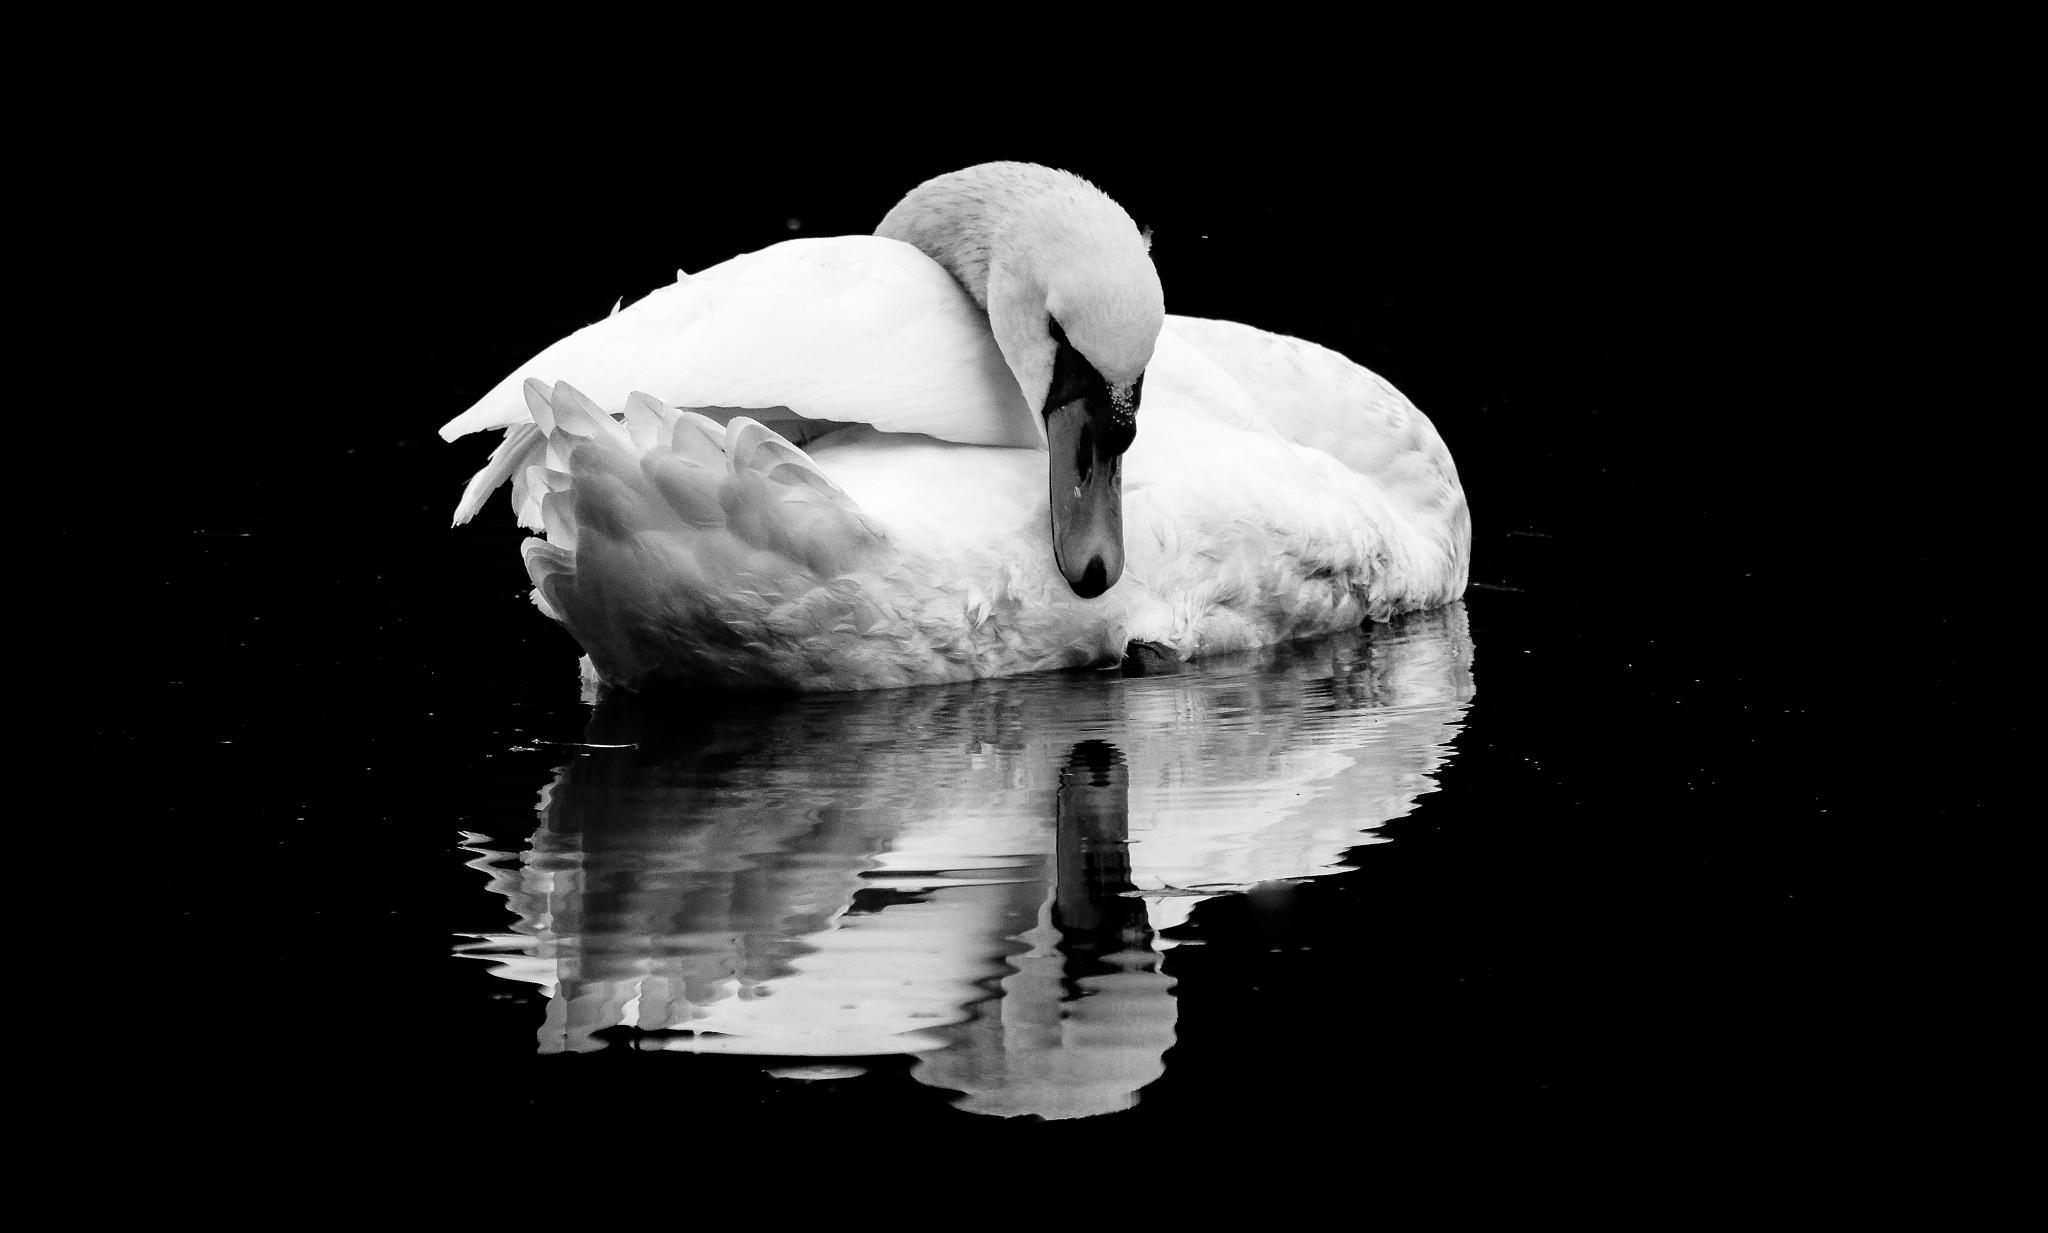 Reflecting by Maldo